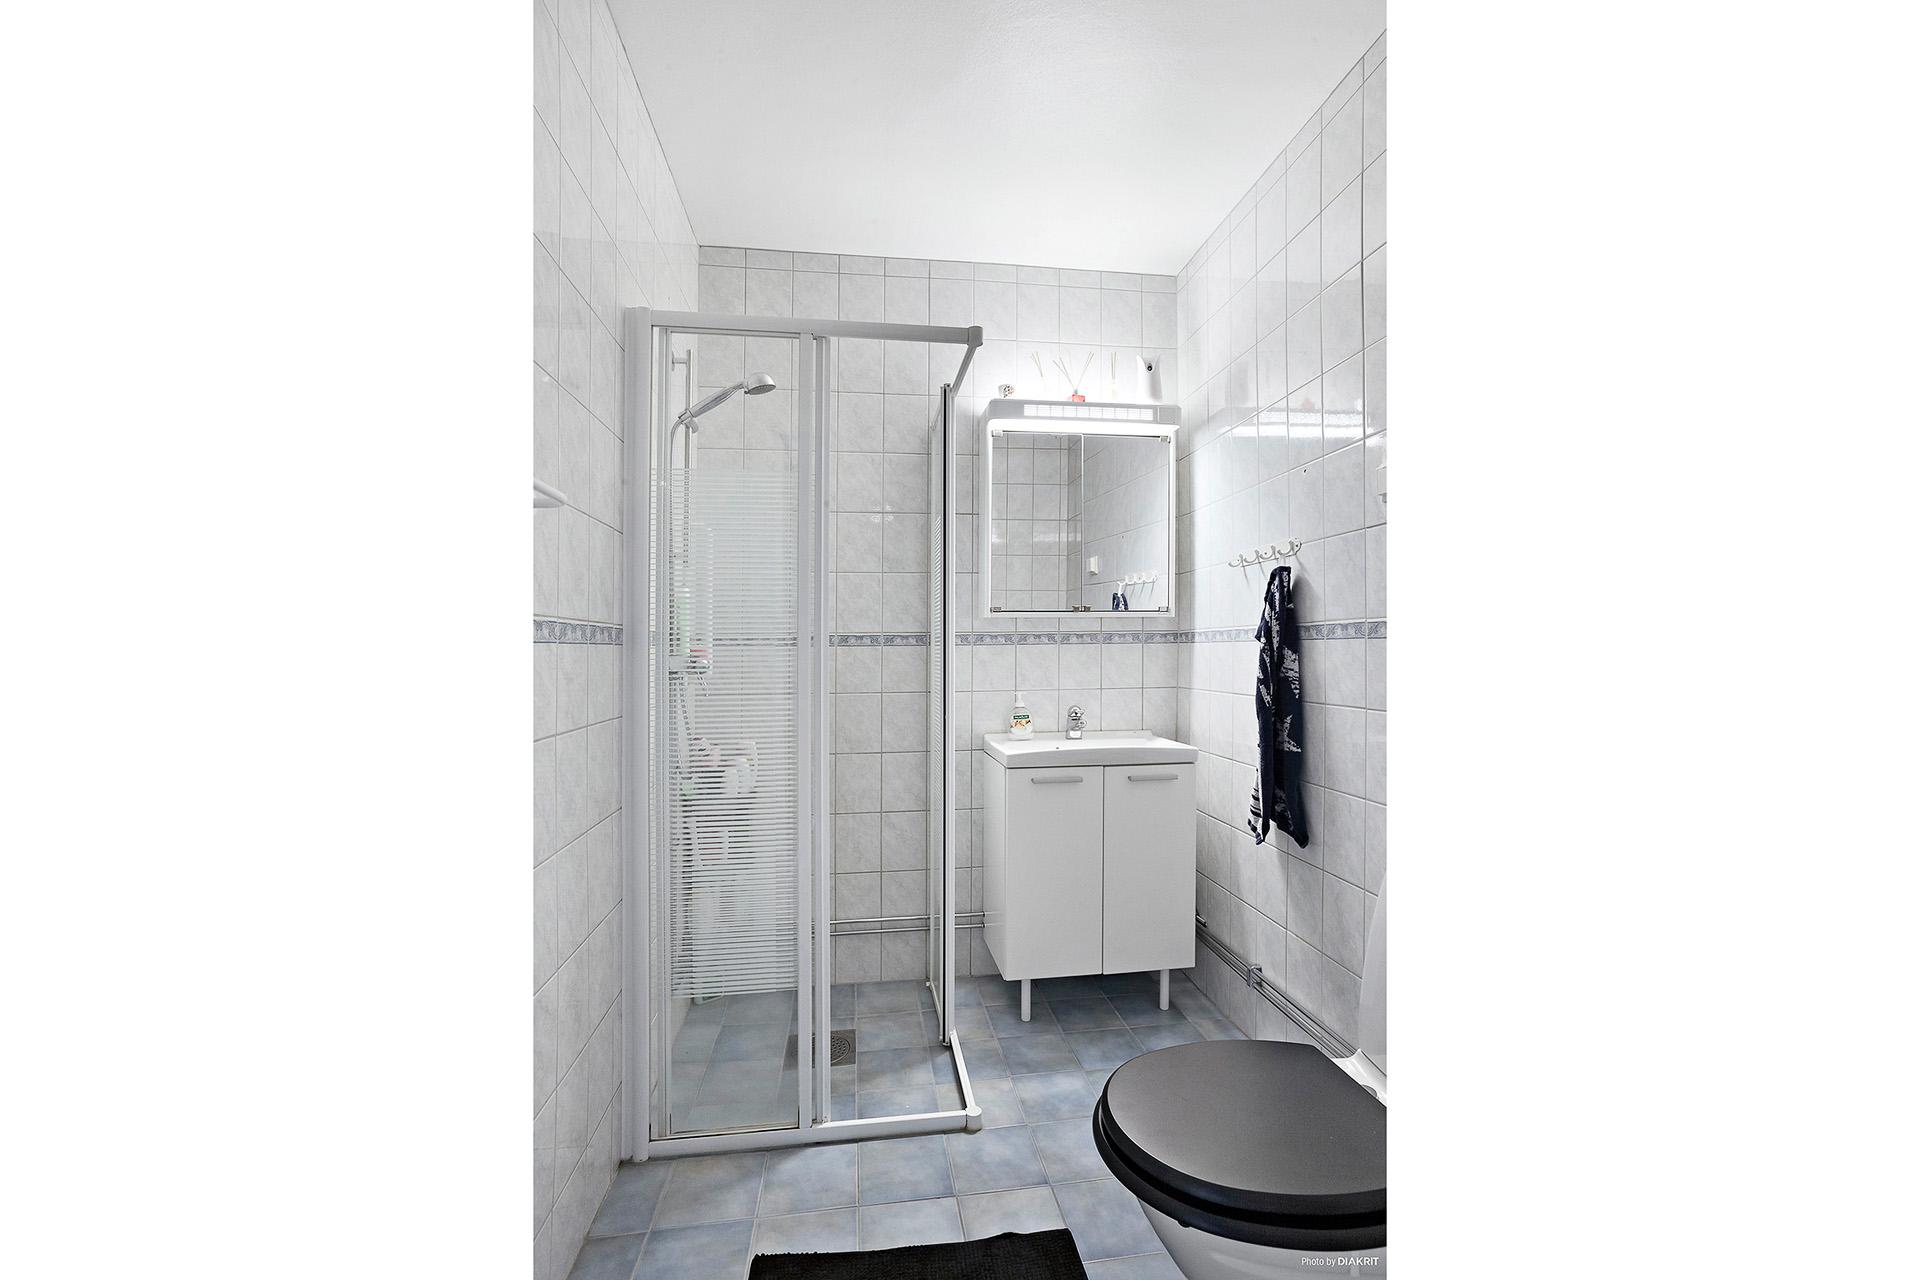 Stambytt och renoverat duschrum (2003)